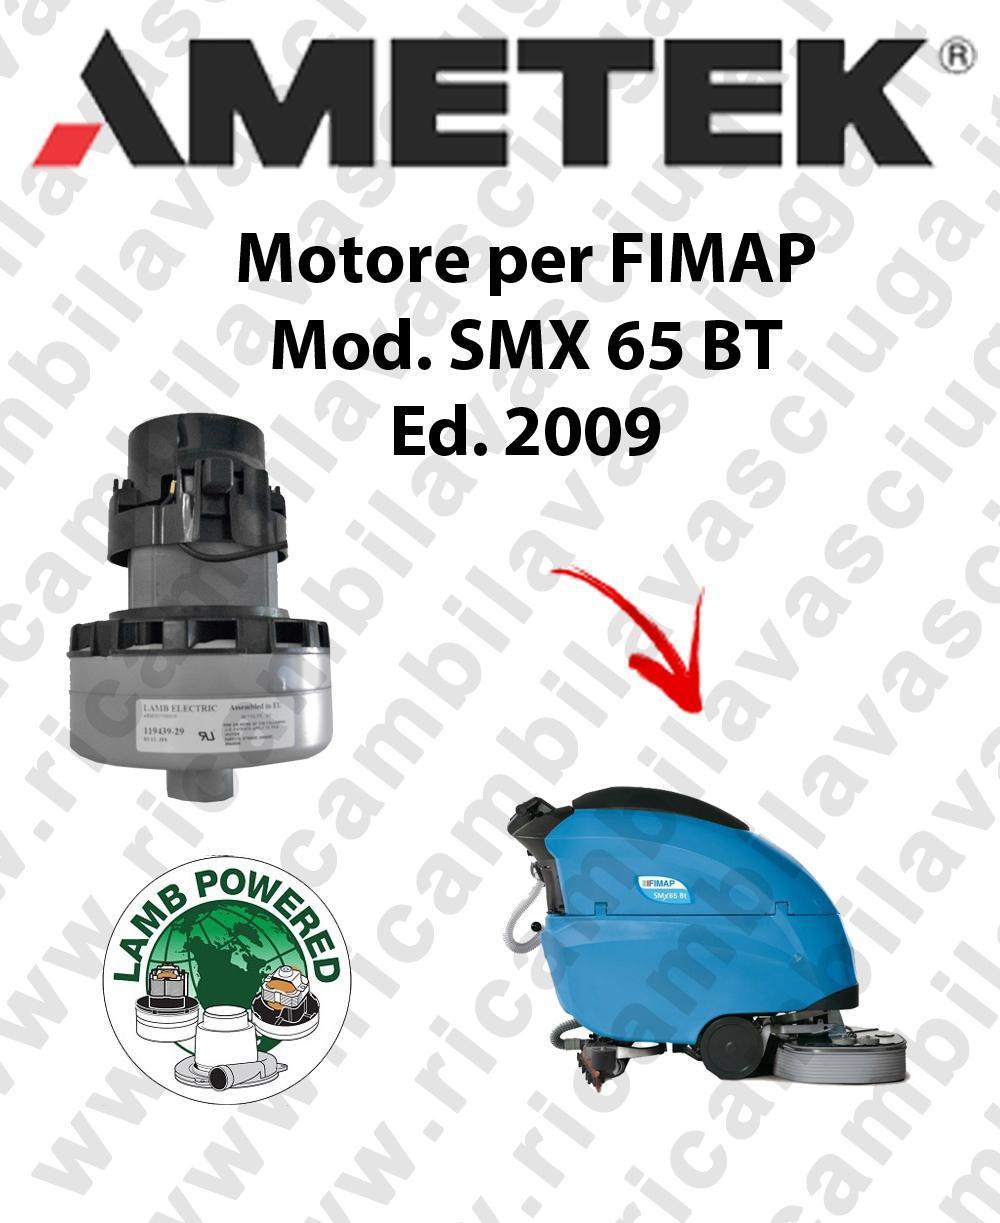 SMX 65 BT 2009 Saugmotor LAMB AMETEK für scheuersaugmaschinen FIMAP